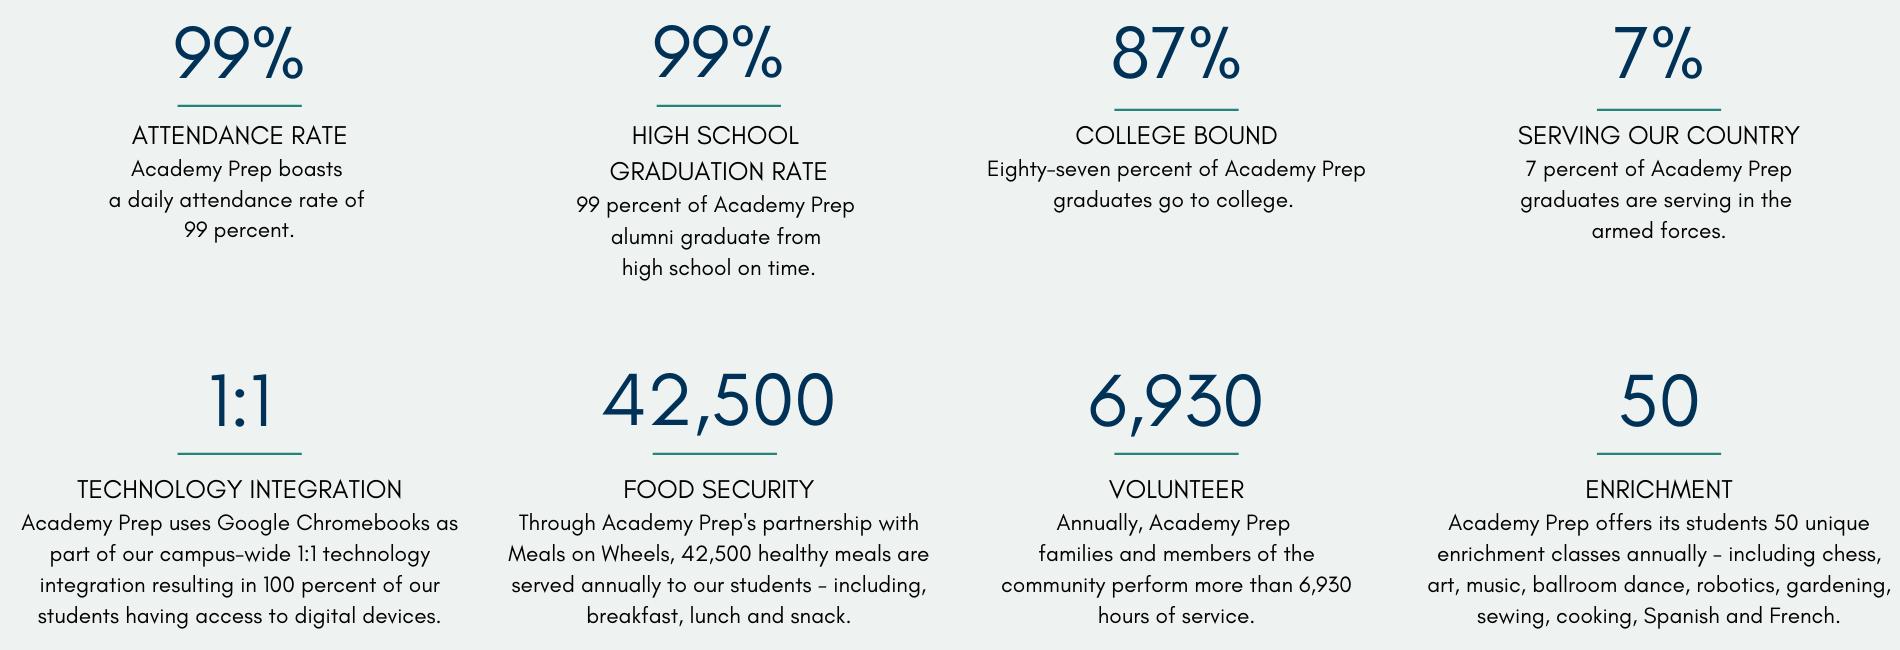 Academy Prep Statistics